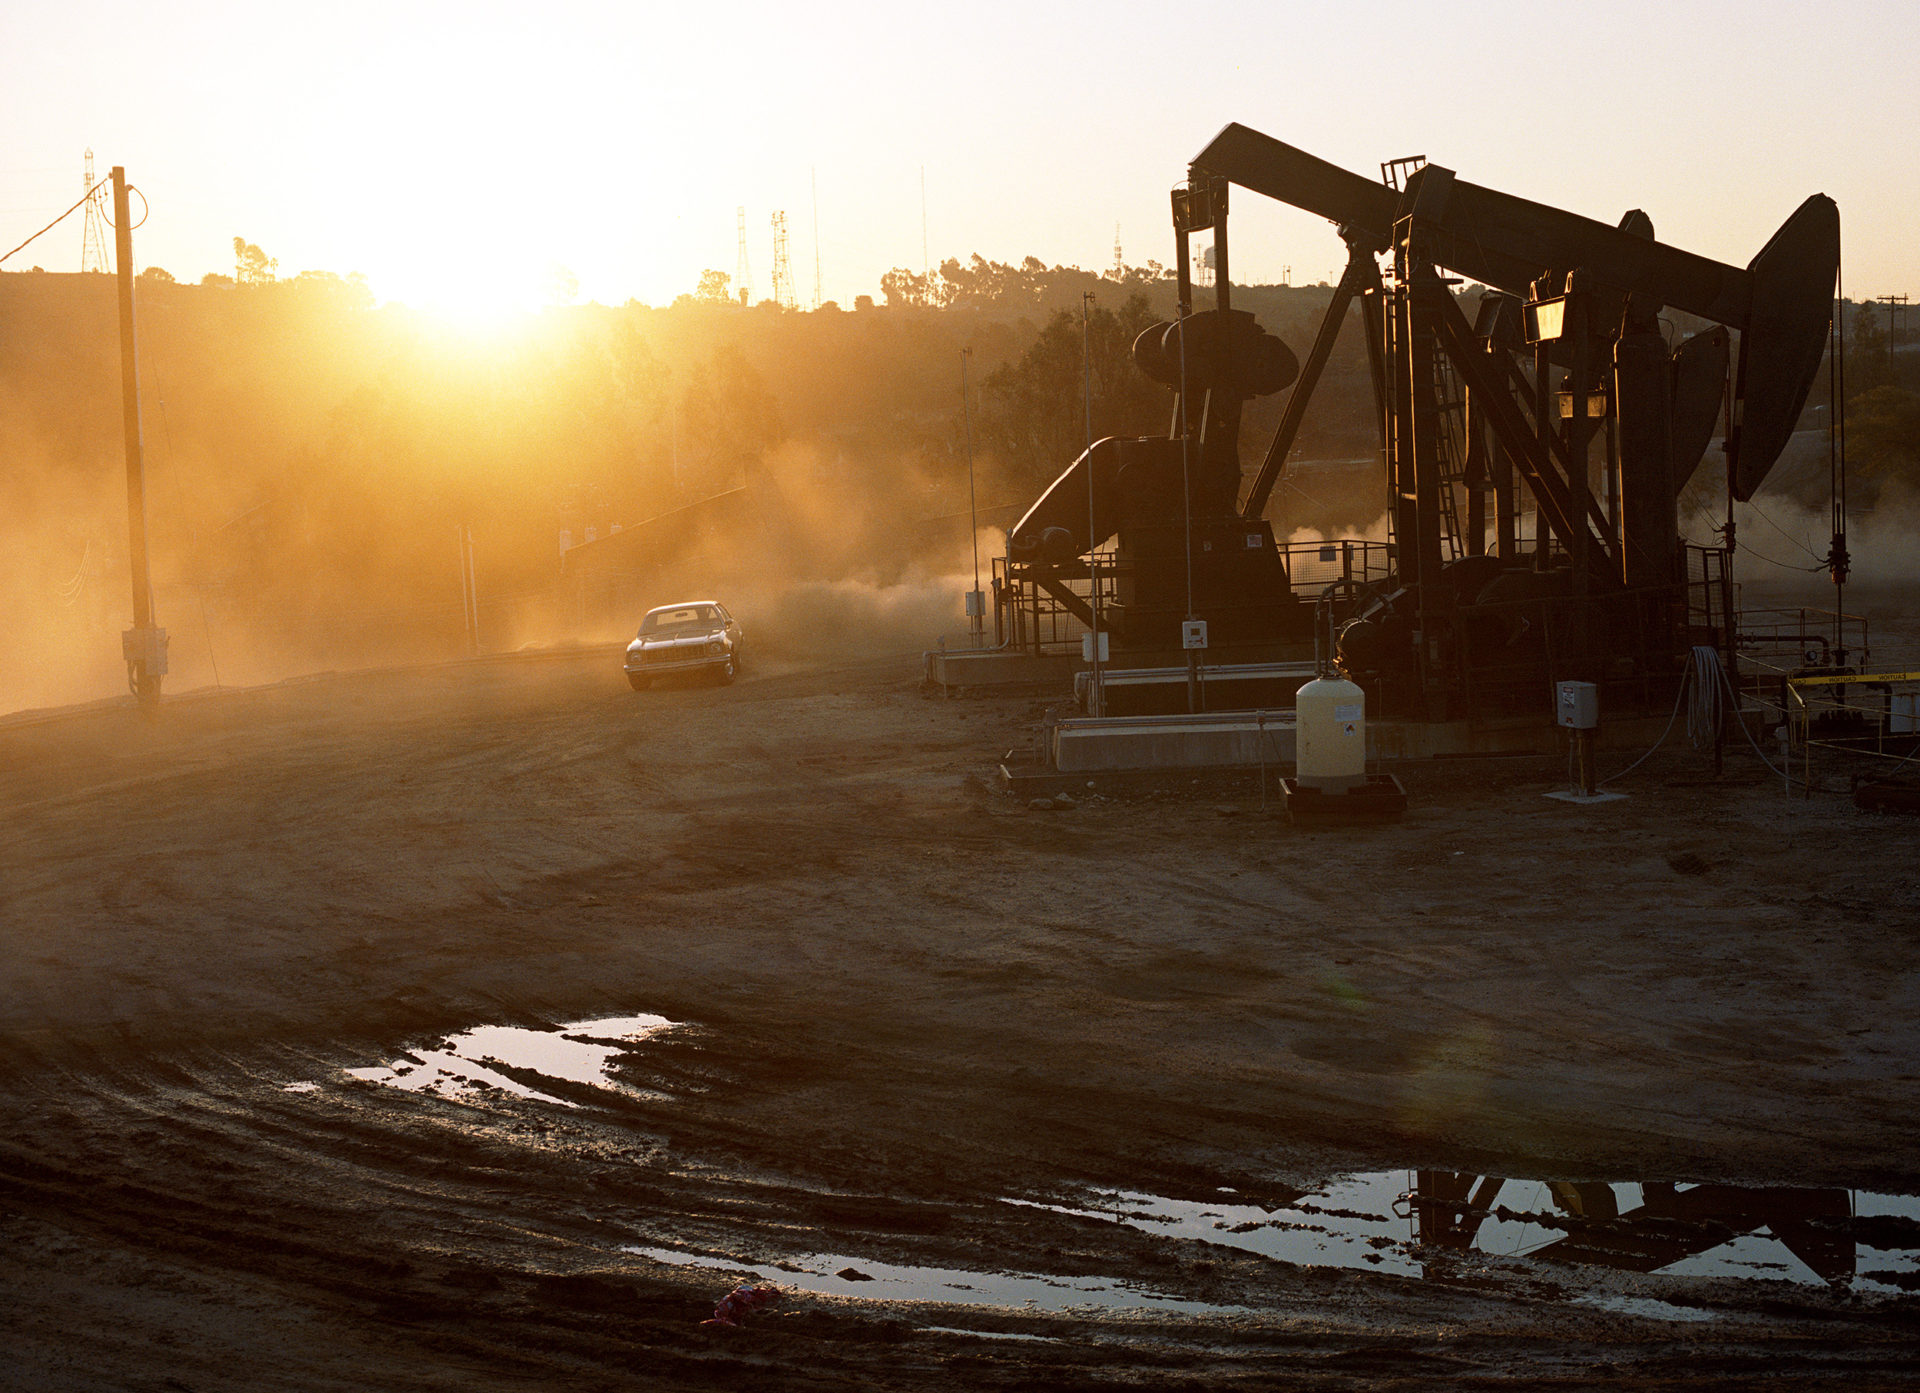 davidblack-cerrogordo-oilfields2-1920x1393